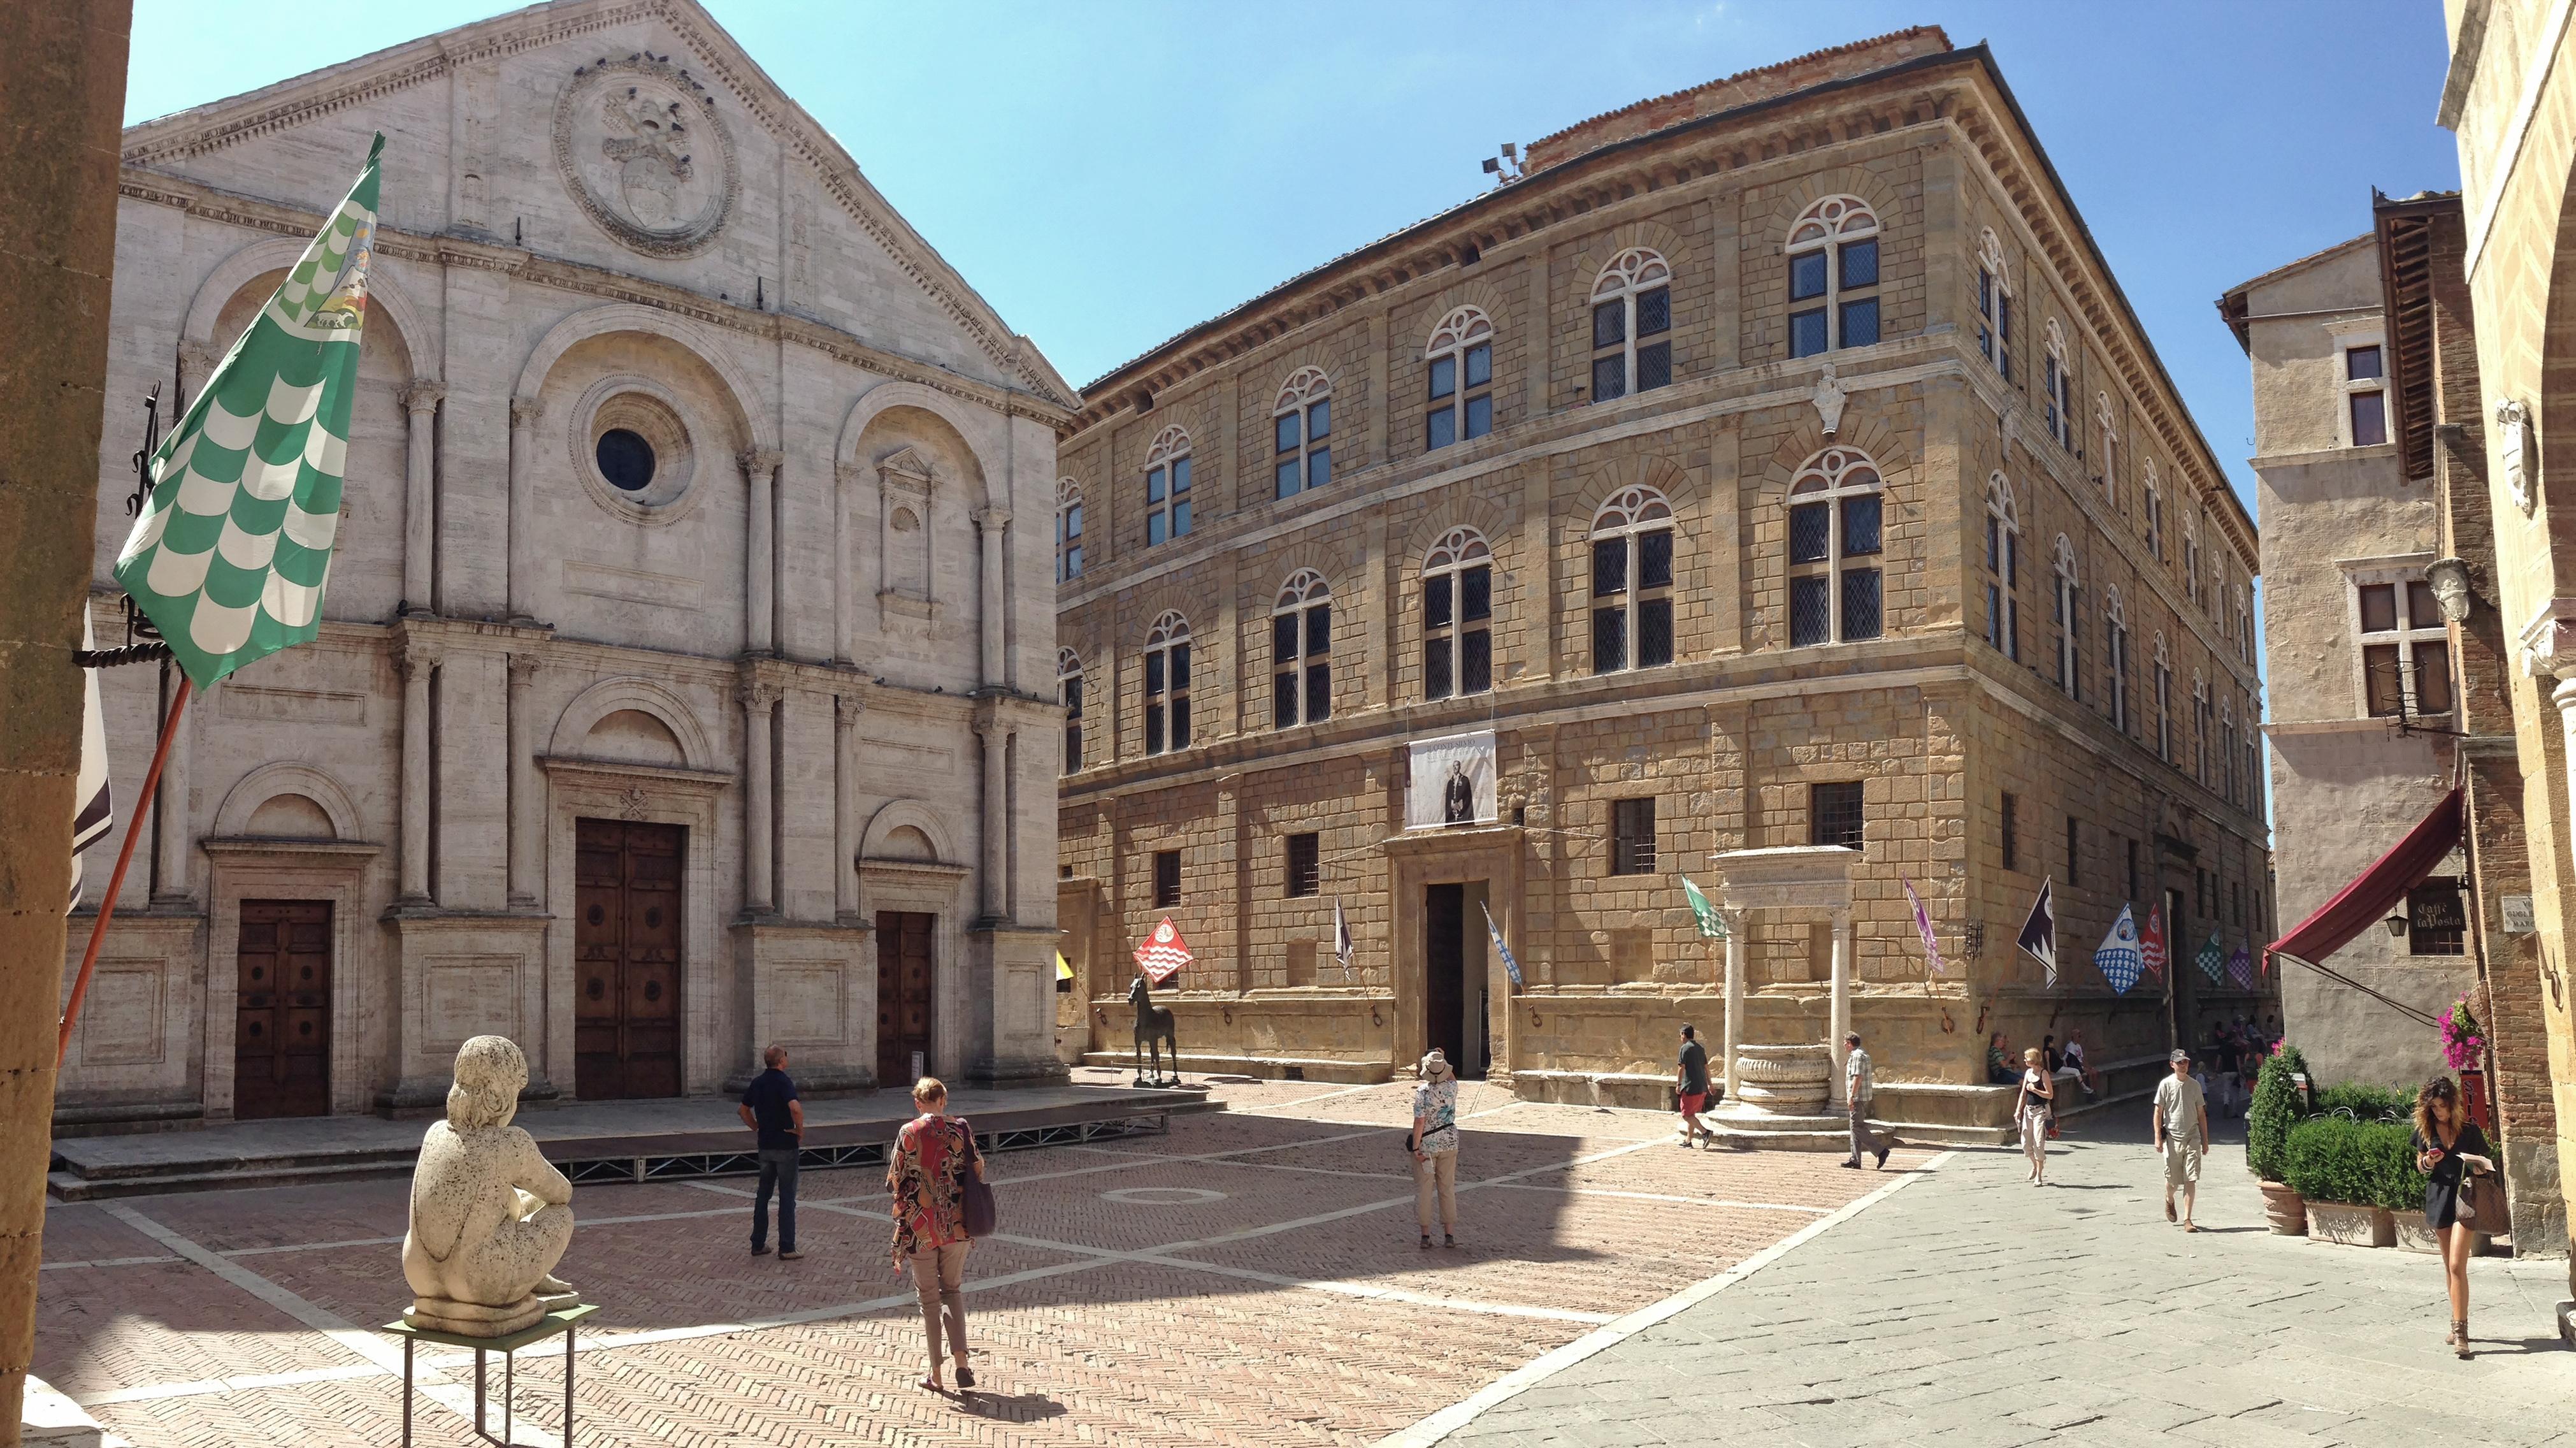 Pienza Piazza Pio II.JPG